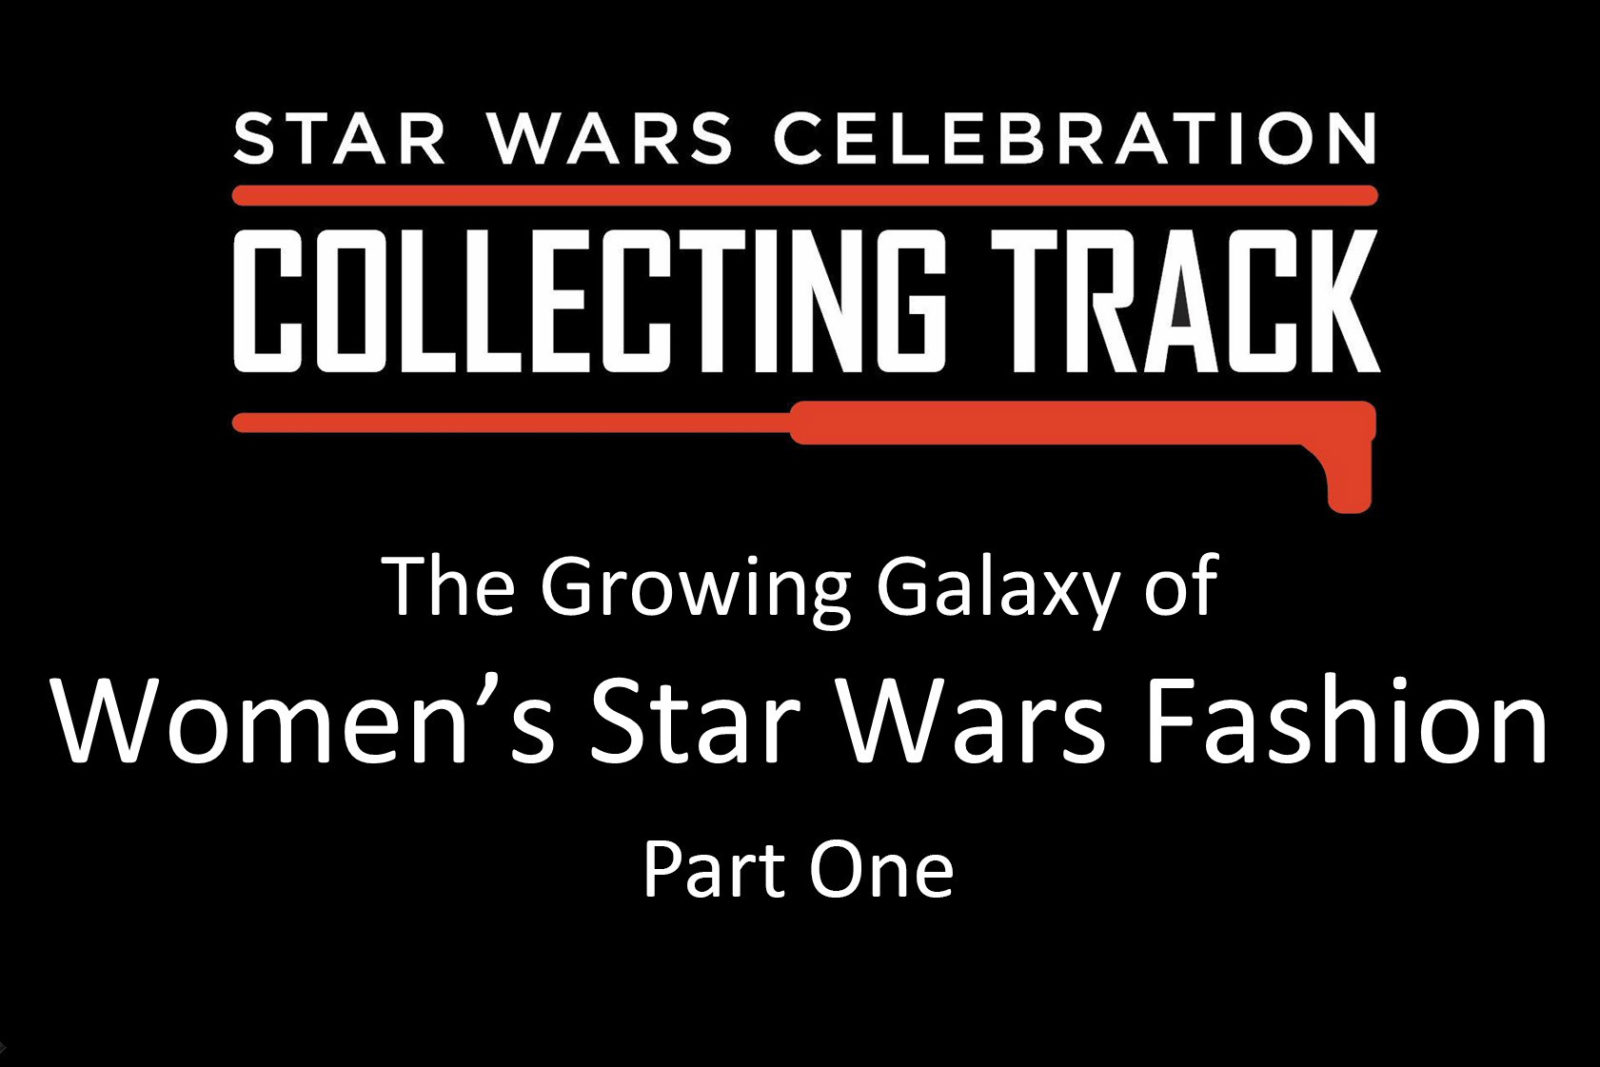 Women's Star Wars Fashion